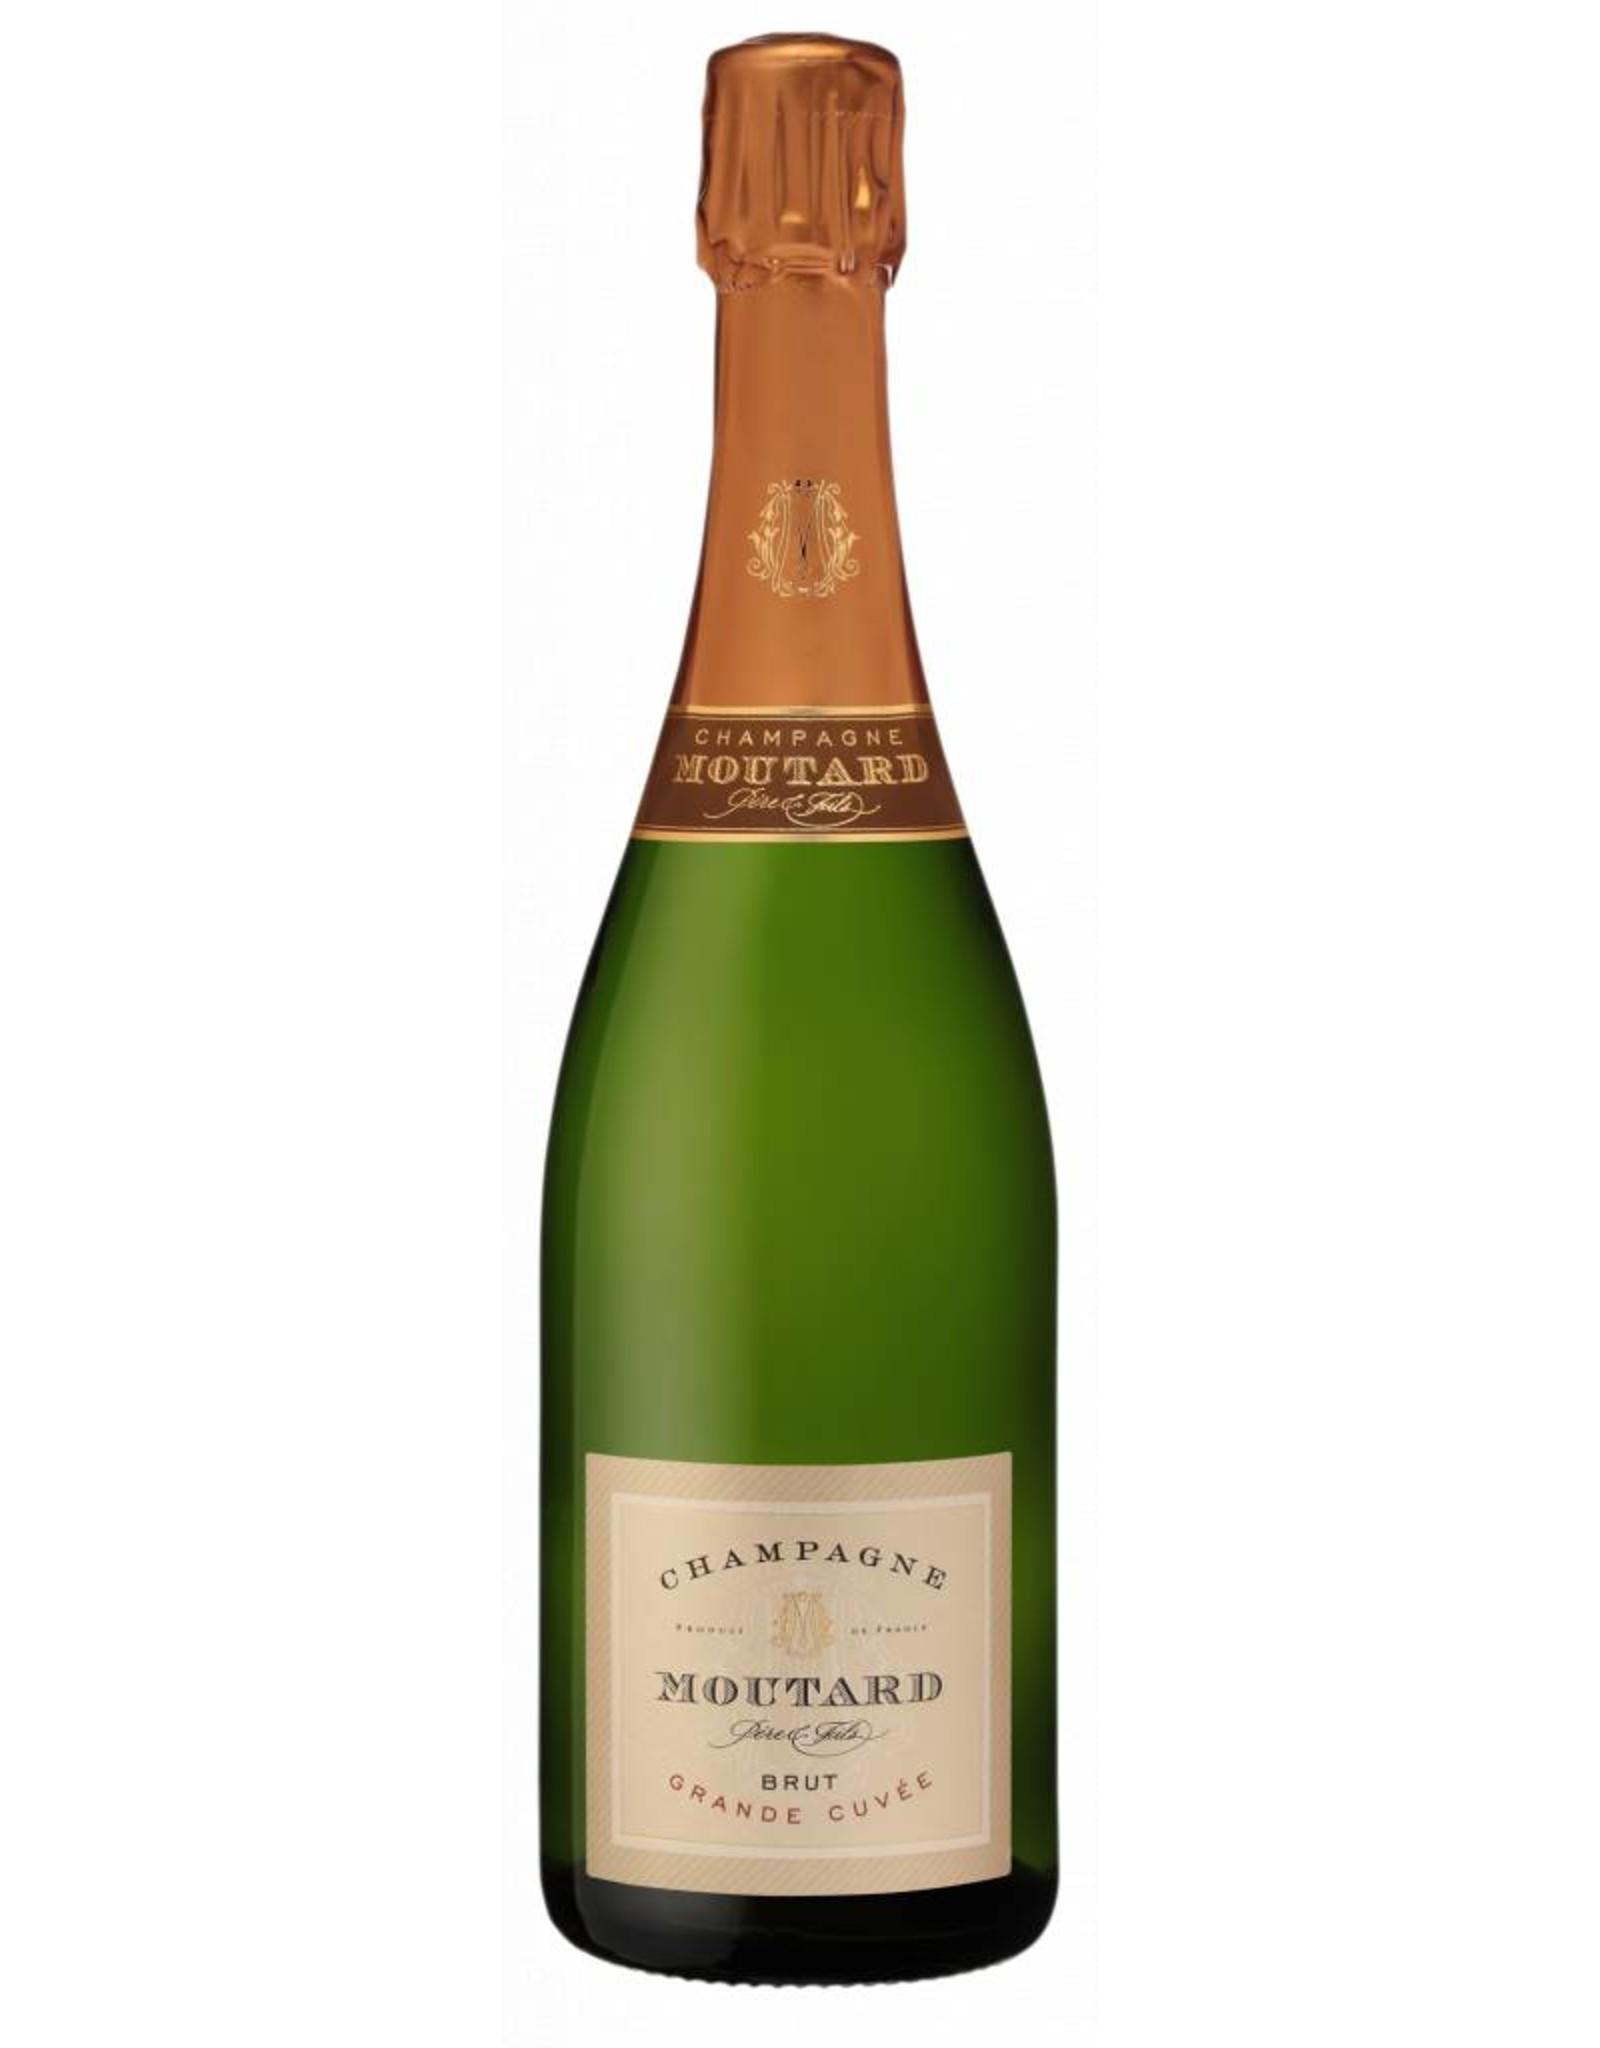 Champagne Moutard Grande Cuvée